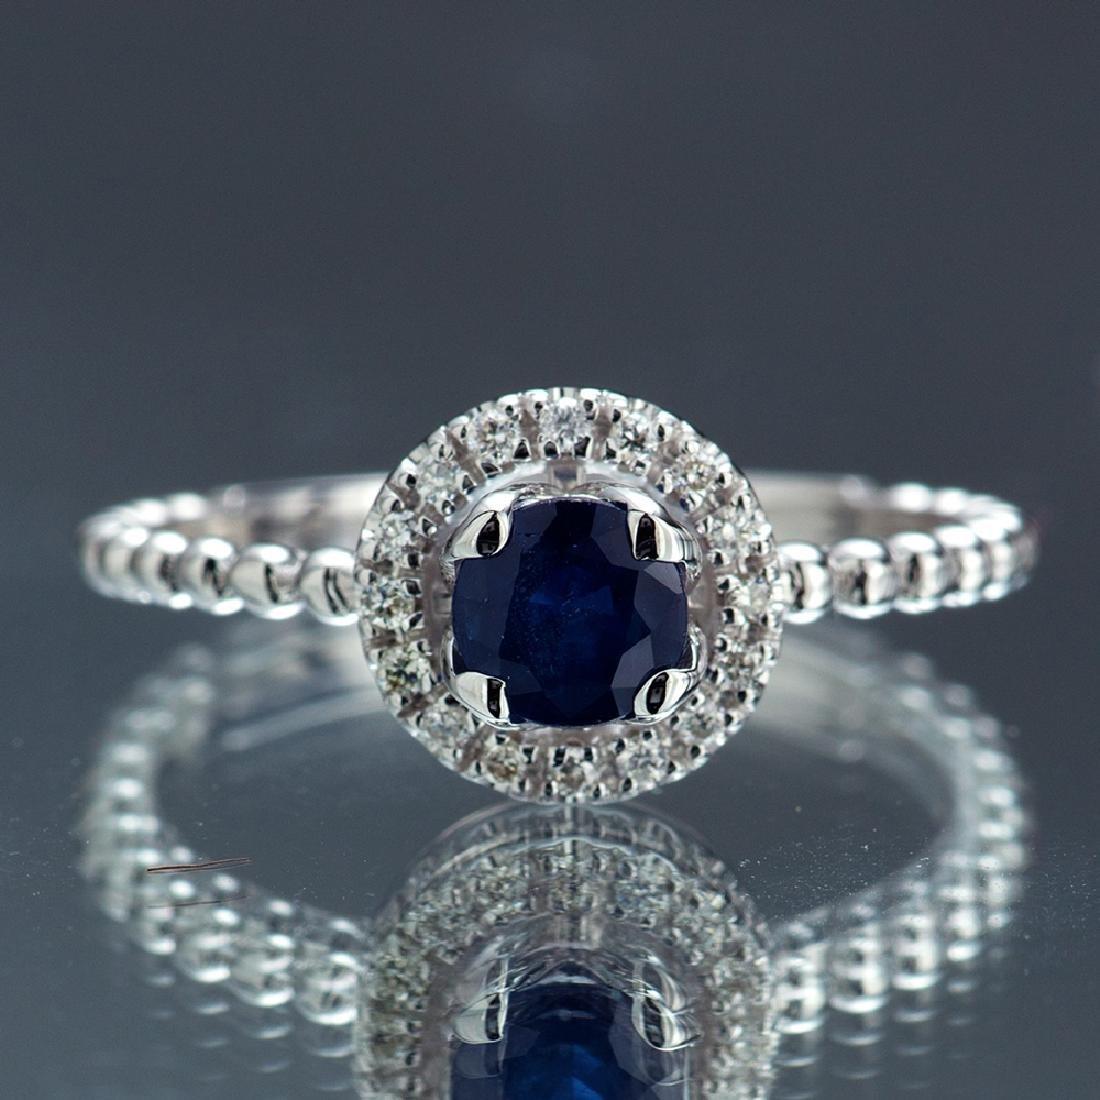 *Fine Jewelry 14 KT White Gold, 0.64CT Round Brilliant